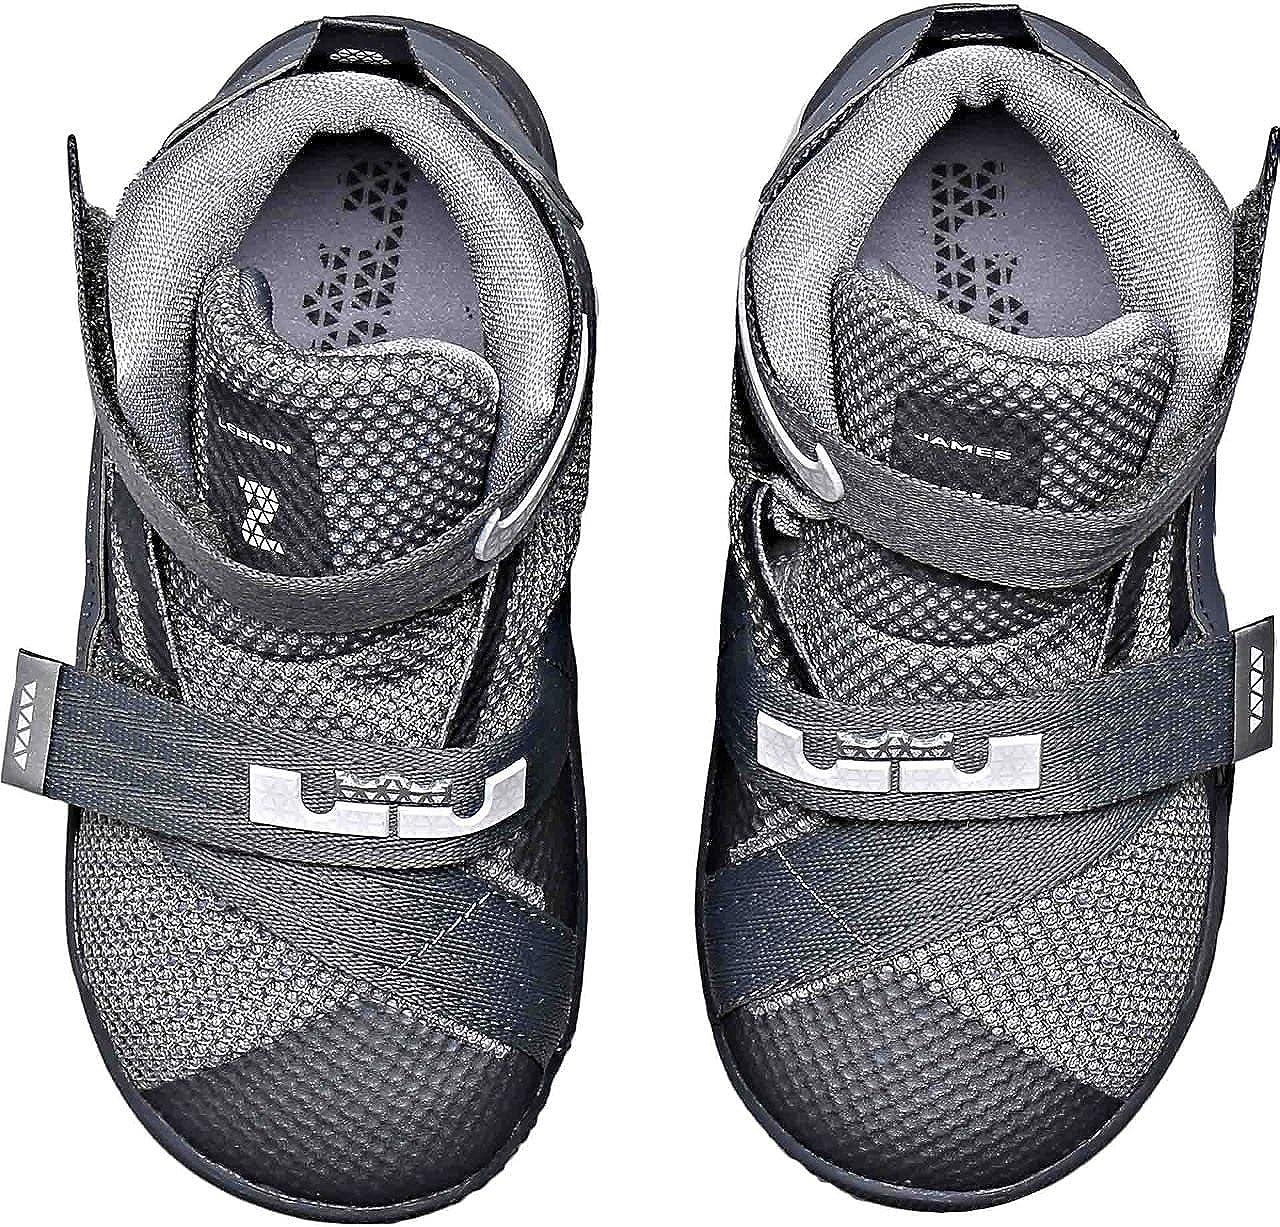 5c Nike Lebron Soldier Ix Td